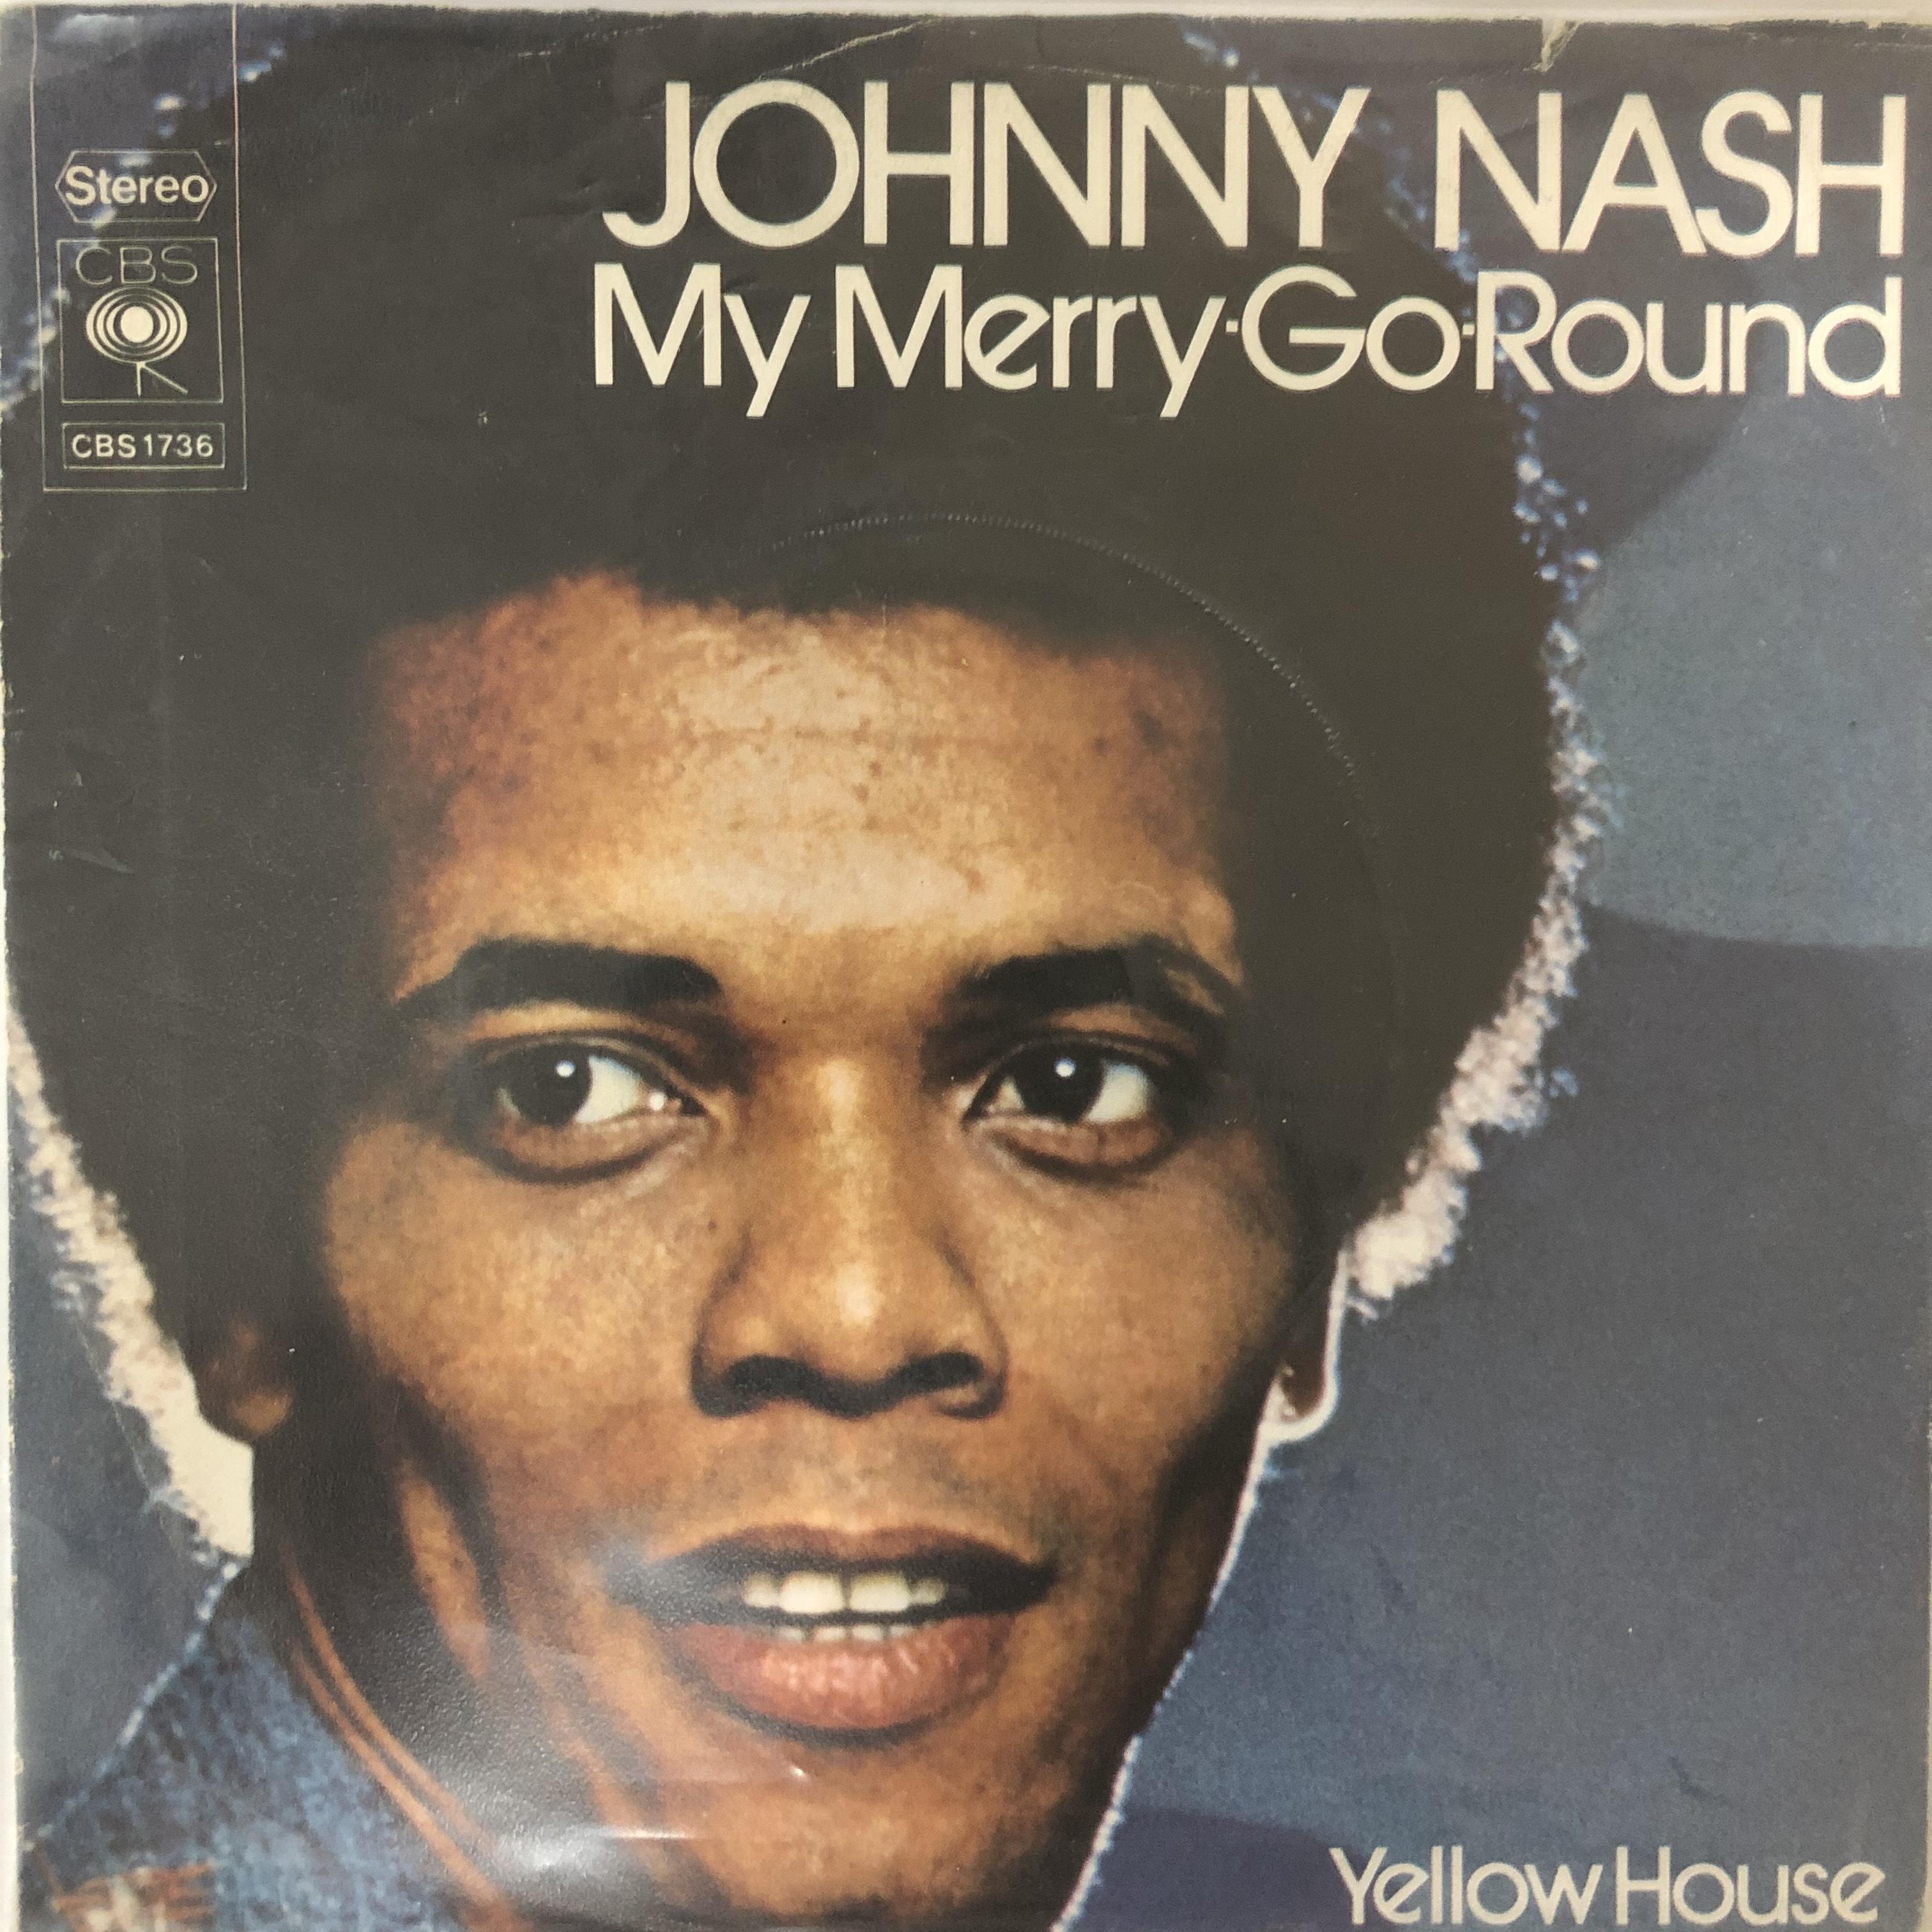 Johnny Nash - My Merry-Go-Round【7-20523】